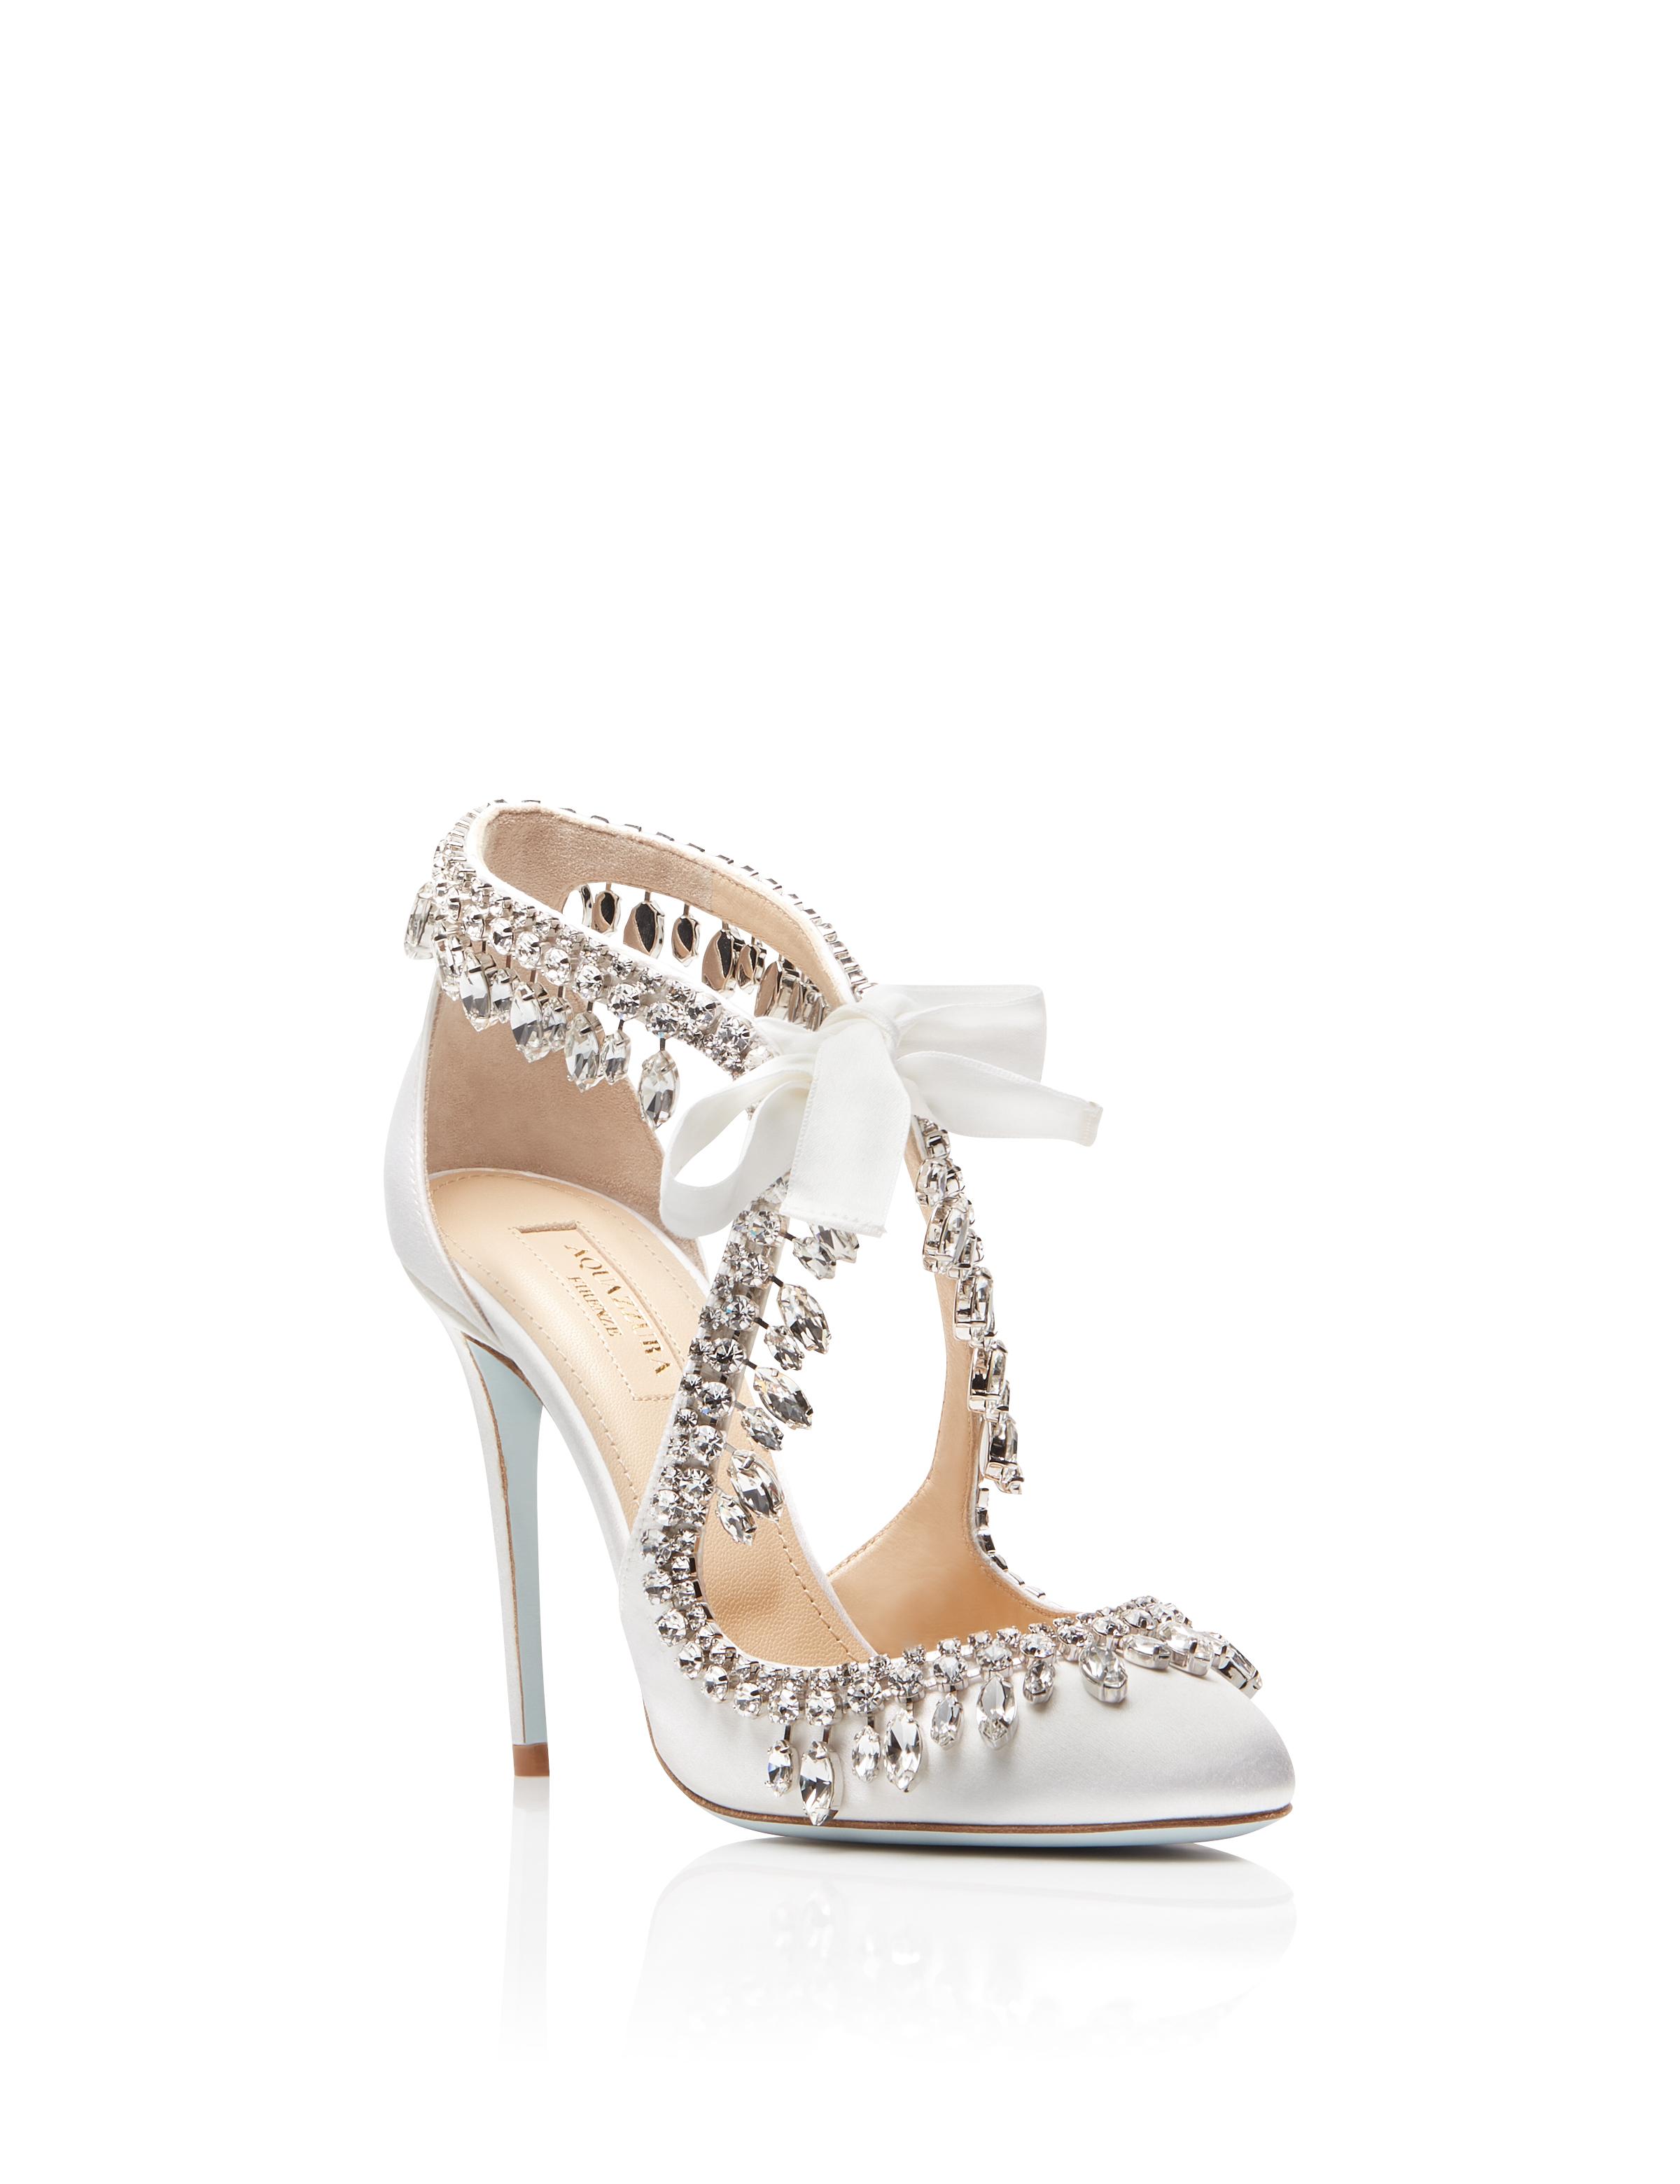 Scarpe Da Sposa Firenze.Scarpe Da Sposa Aquazzura Shoeplay Fashion Blog Di Scarpe Da Donna